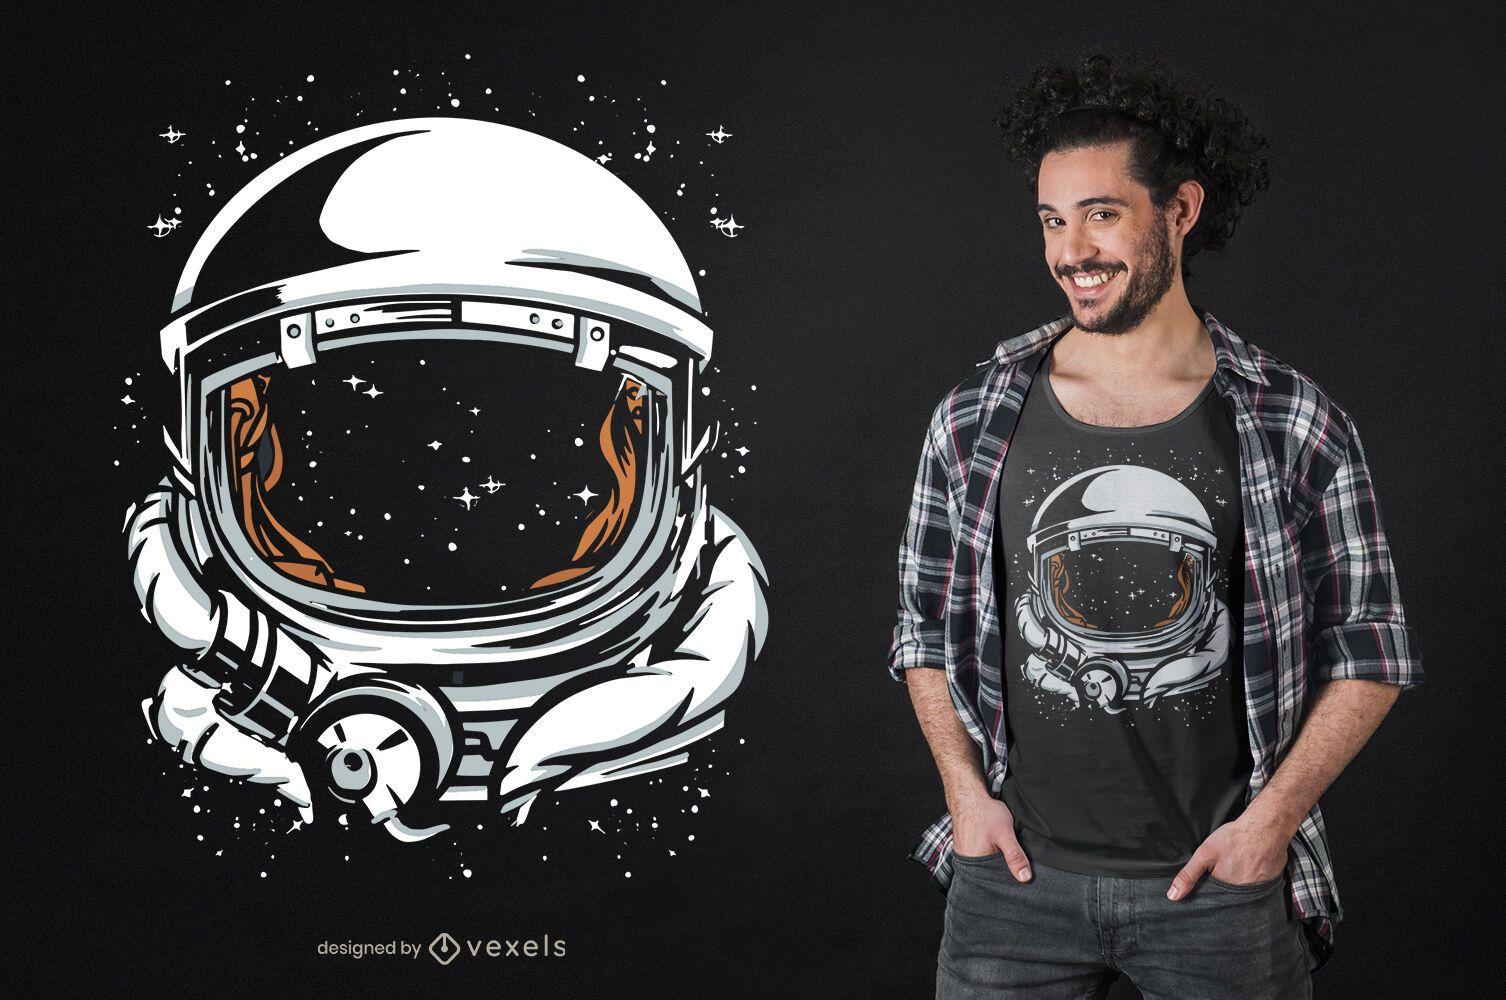 Astronaut helmet space t-shirt design